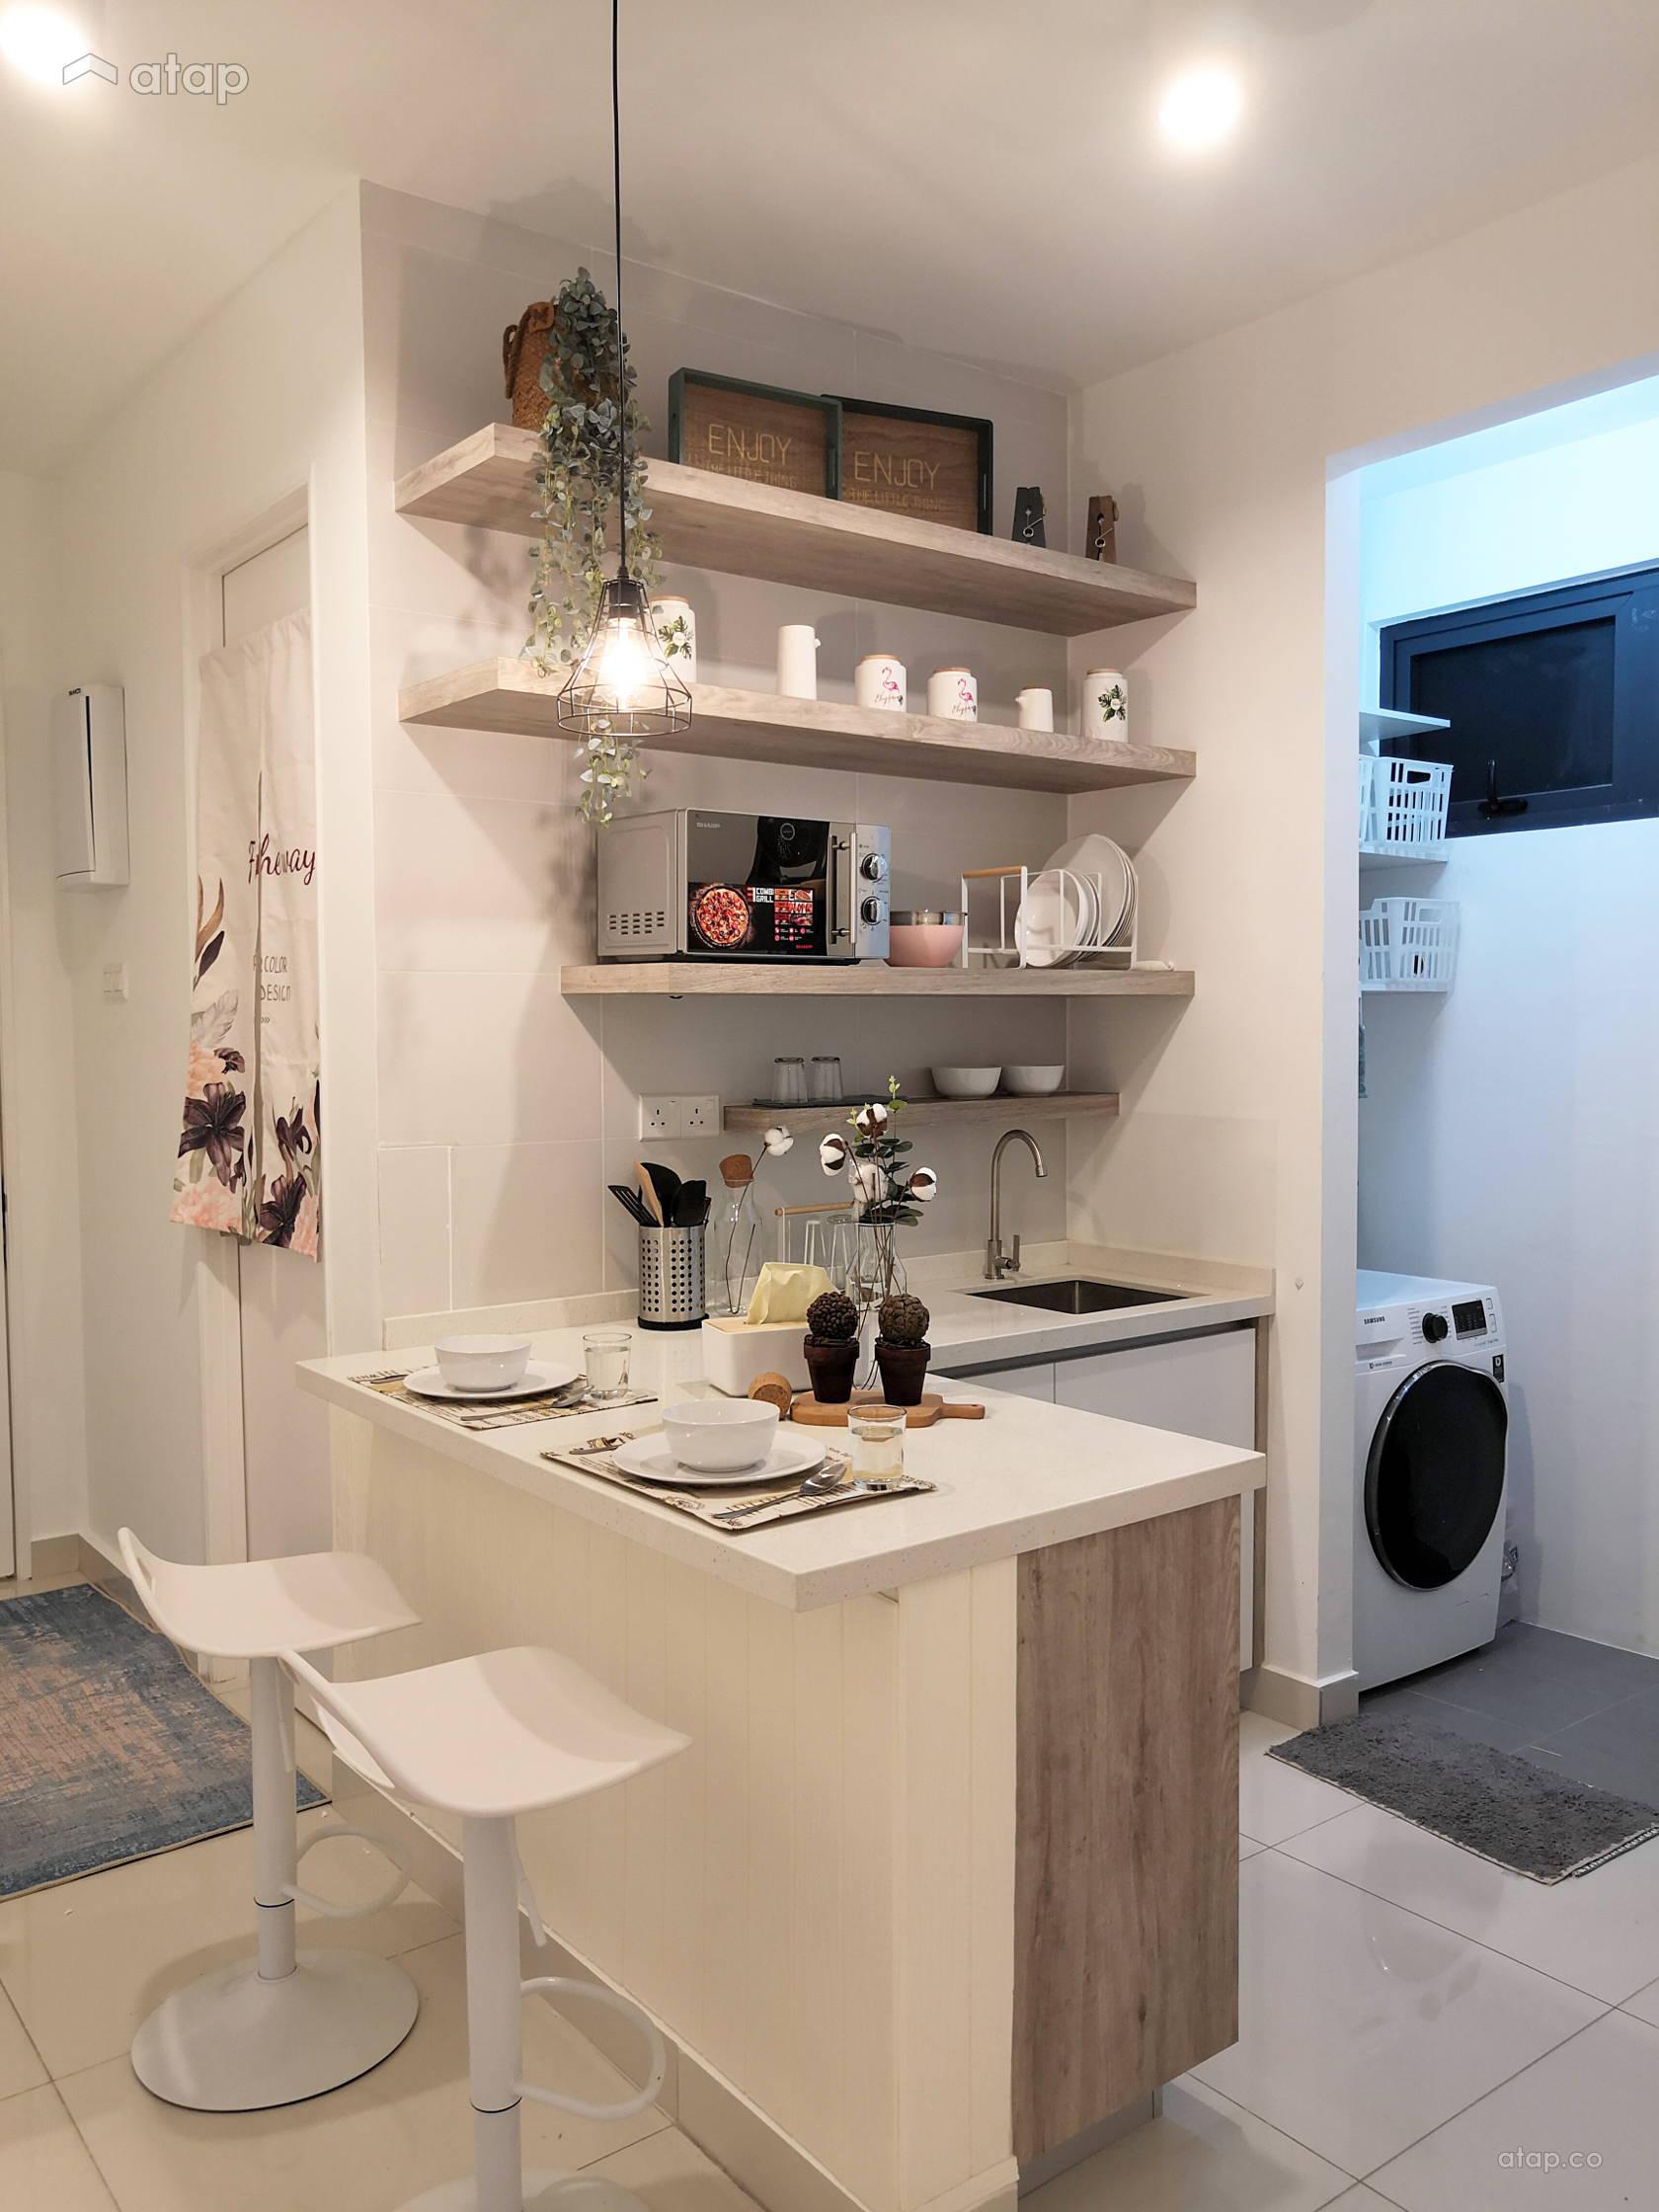 Arte S Kitchen Cabinet interior design renovation ideas, photos ...